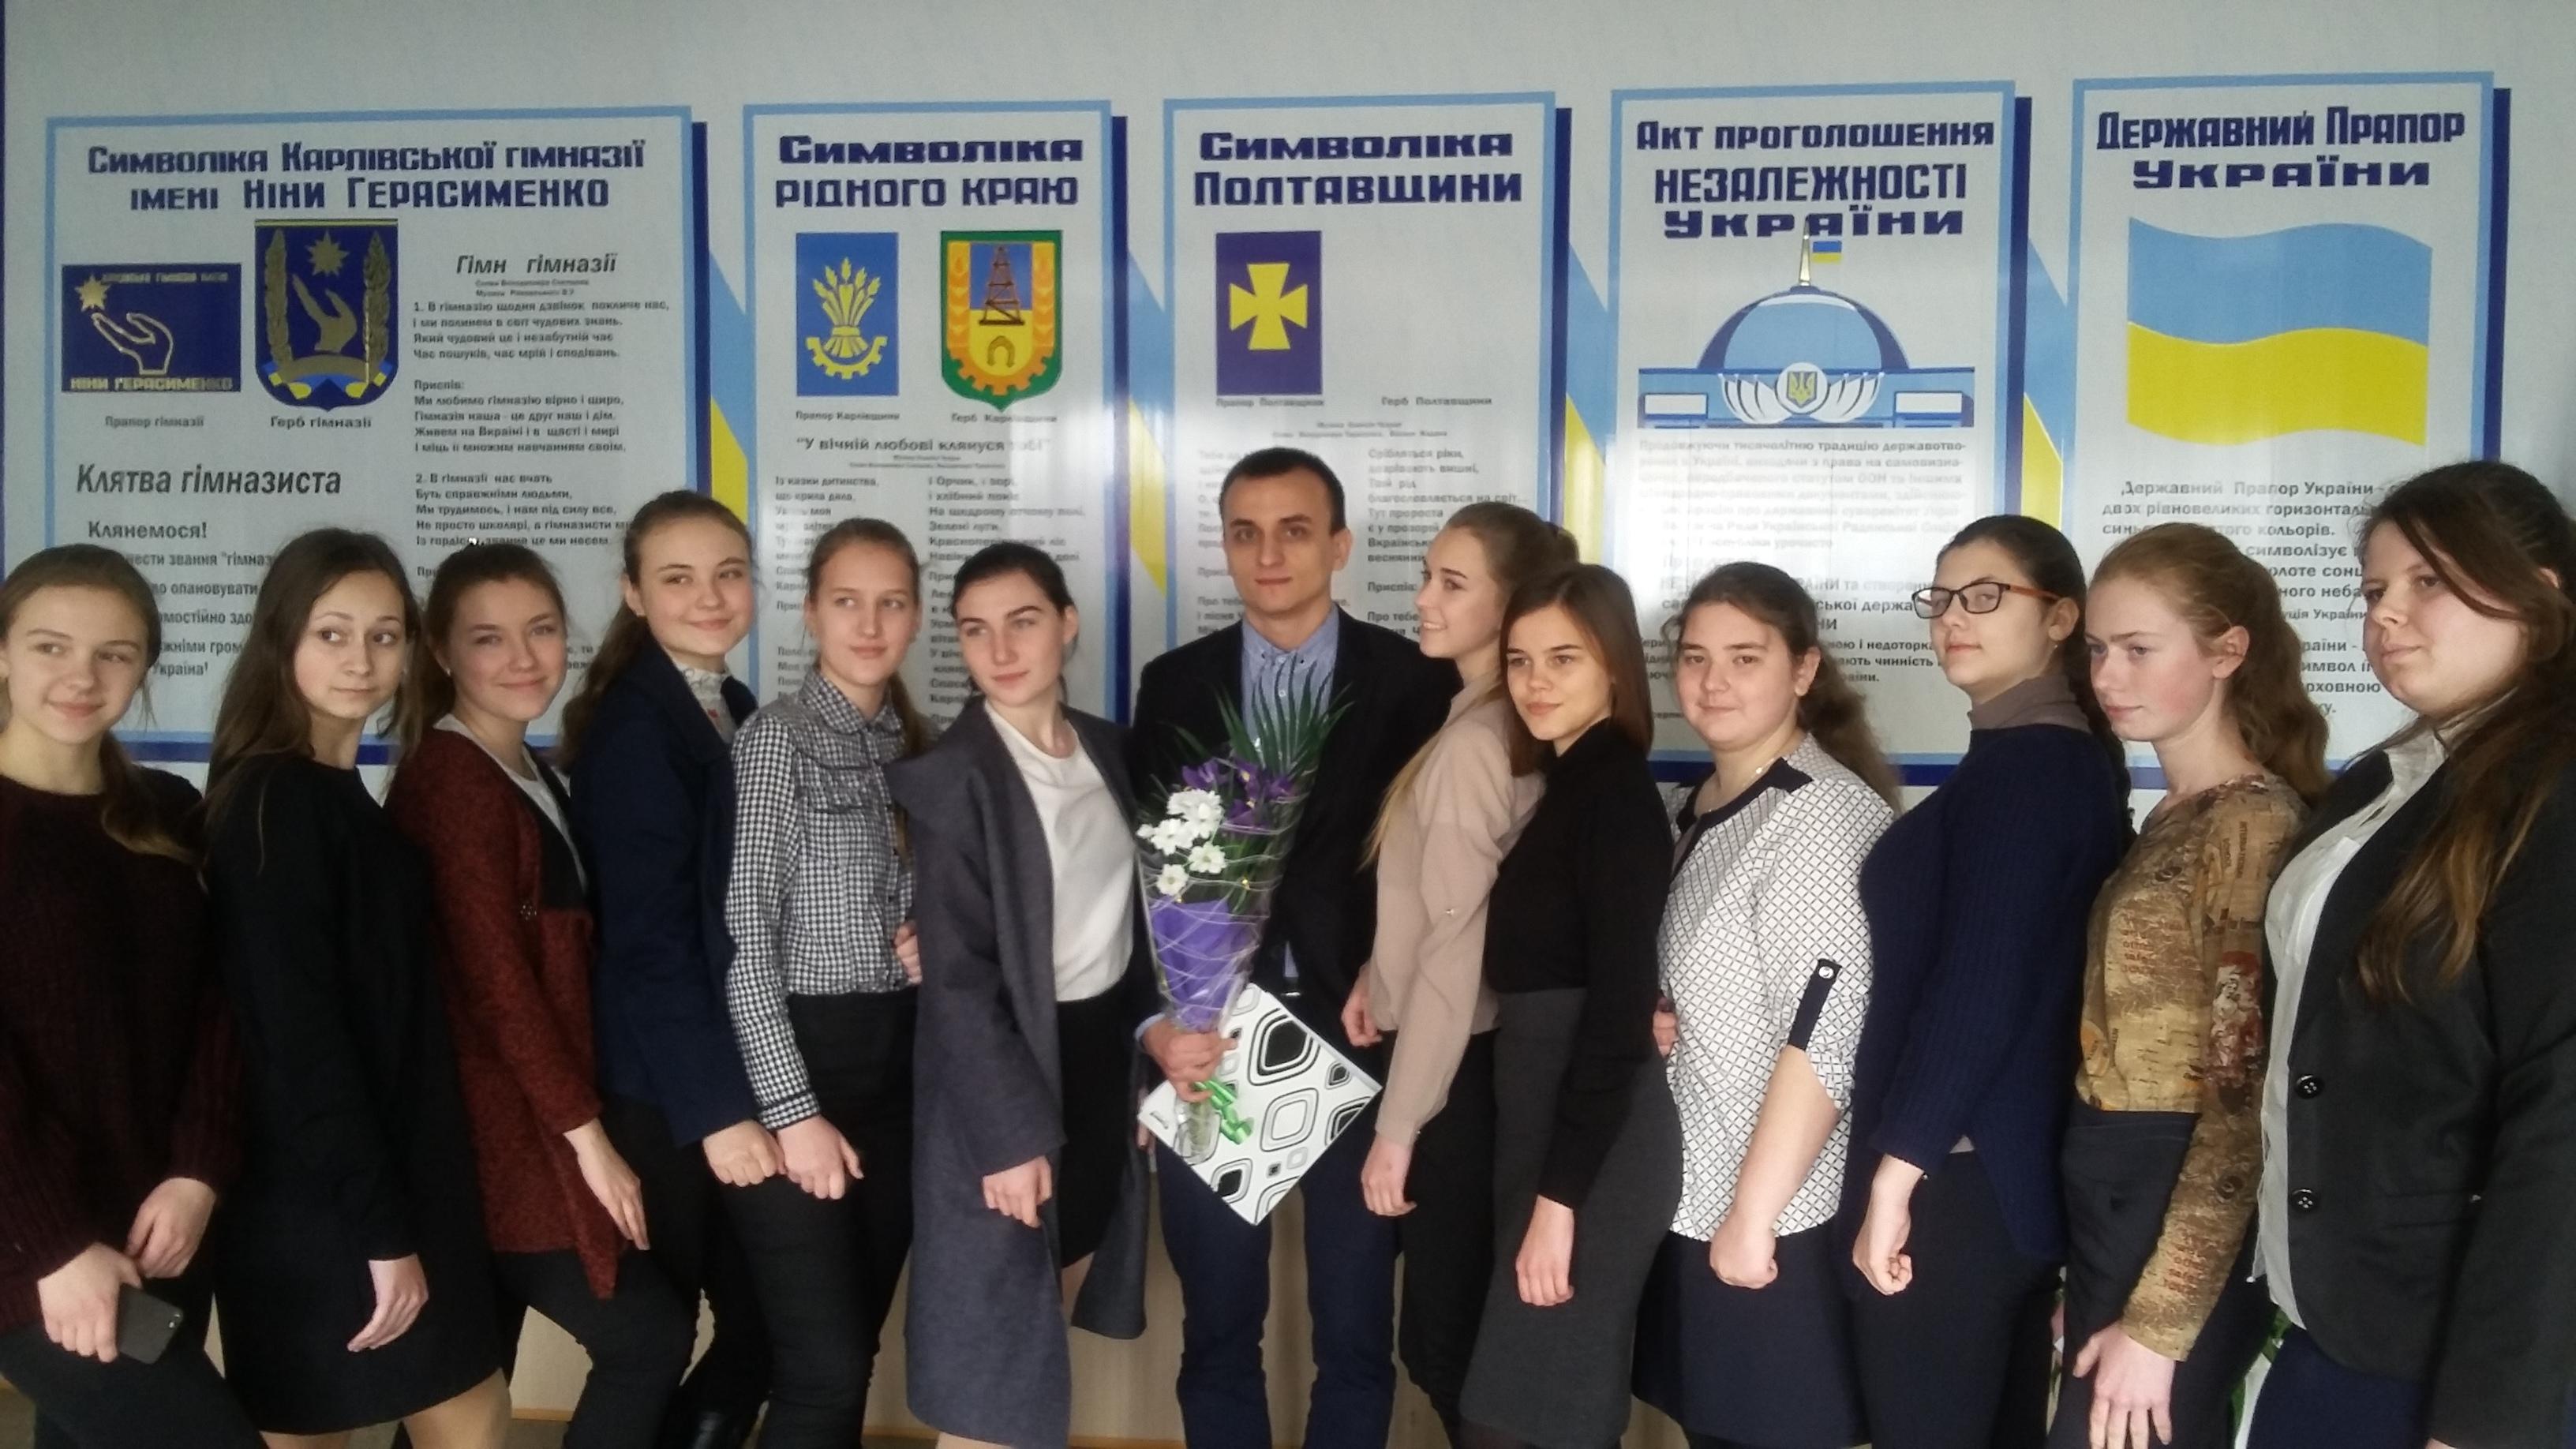 http://karl-gymnasium.at.ua/2a/20171206_121400.jpg